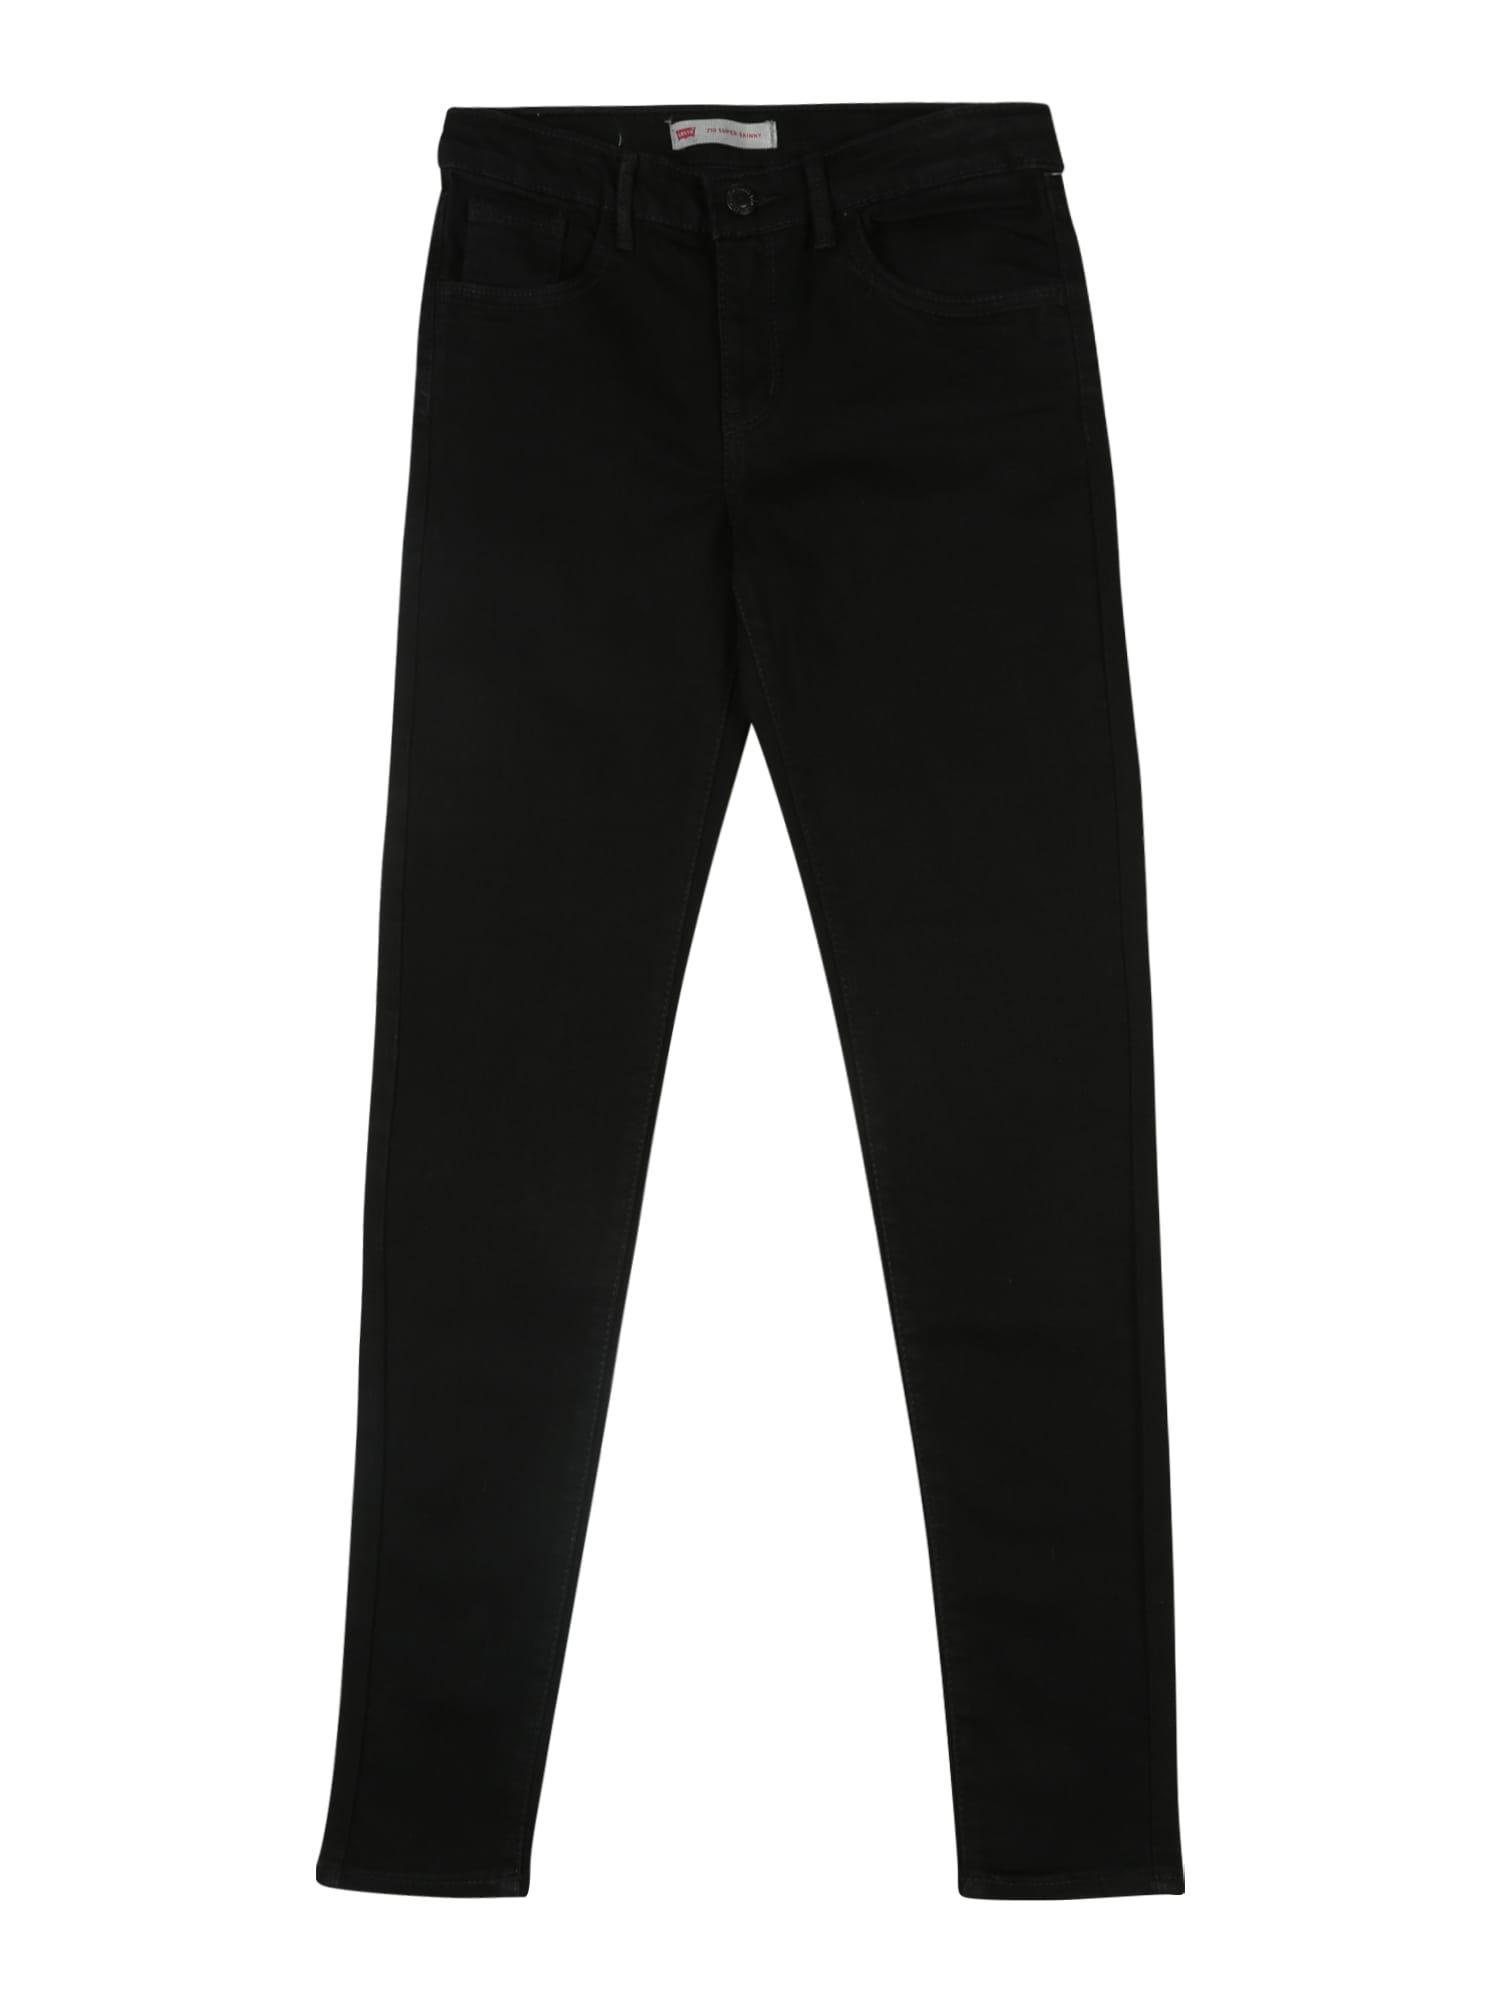 LEVI'S Džinsai '710 Super Skinny' juodo džinso spalva